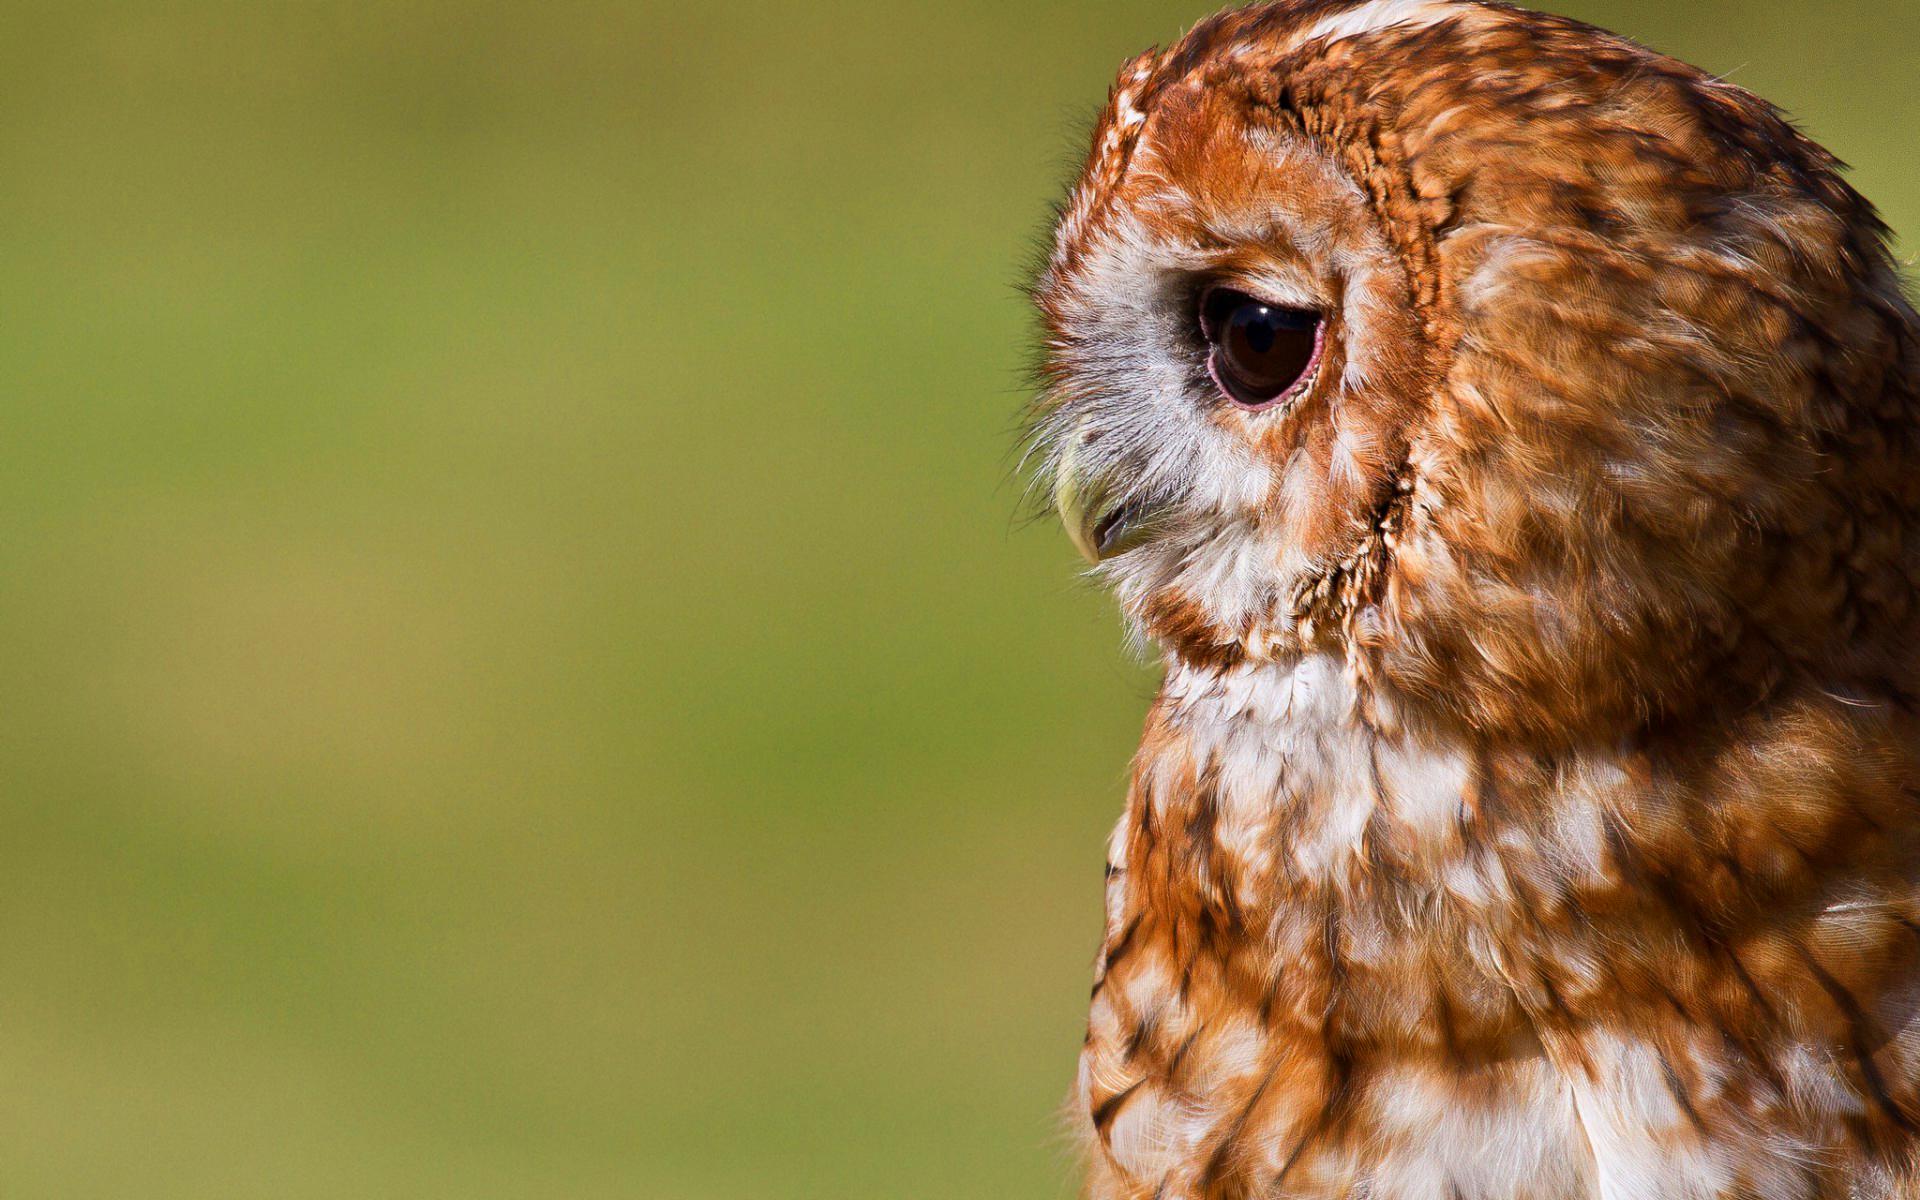 cute owl bird